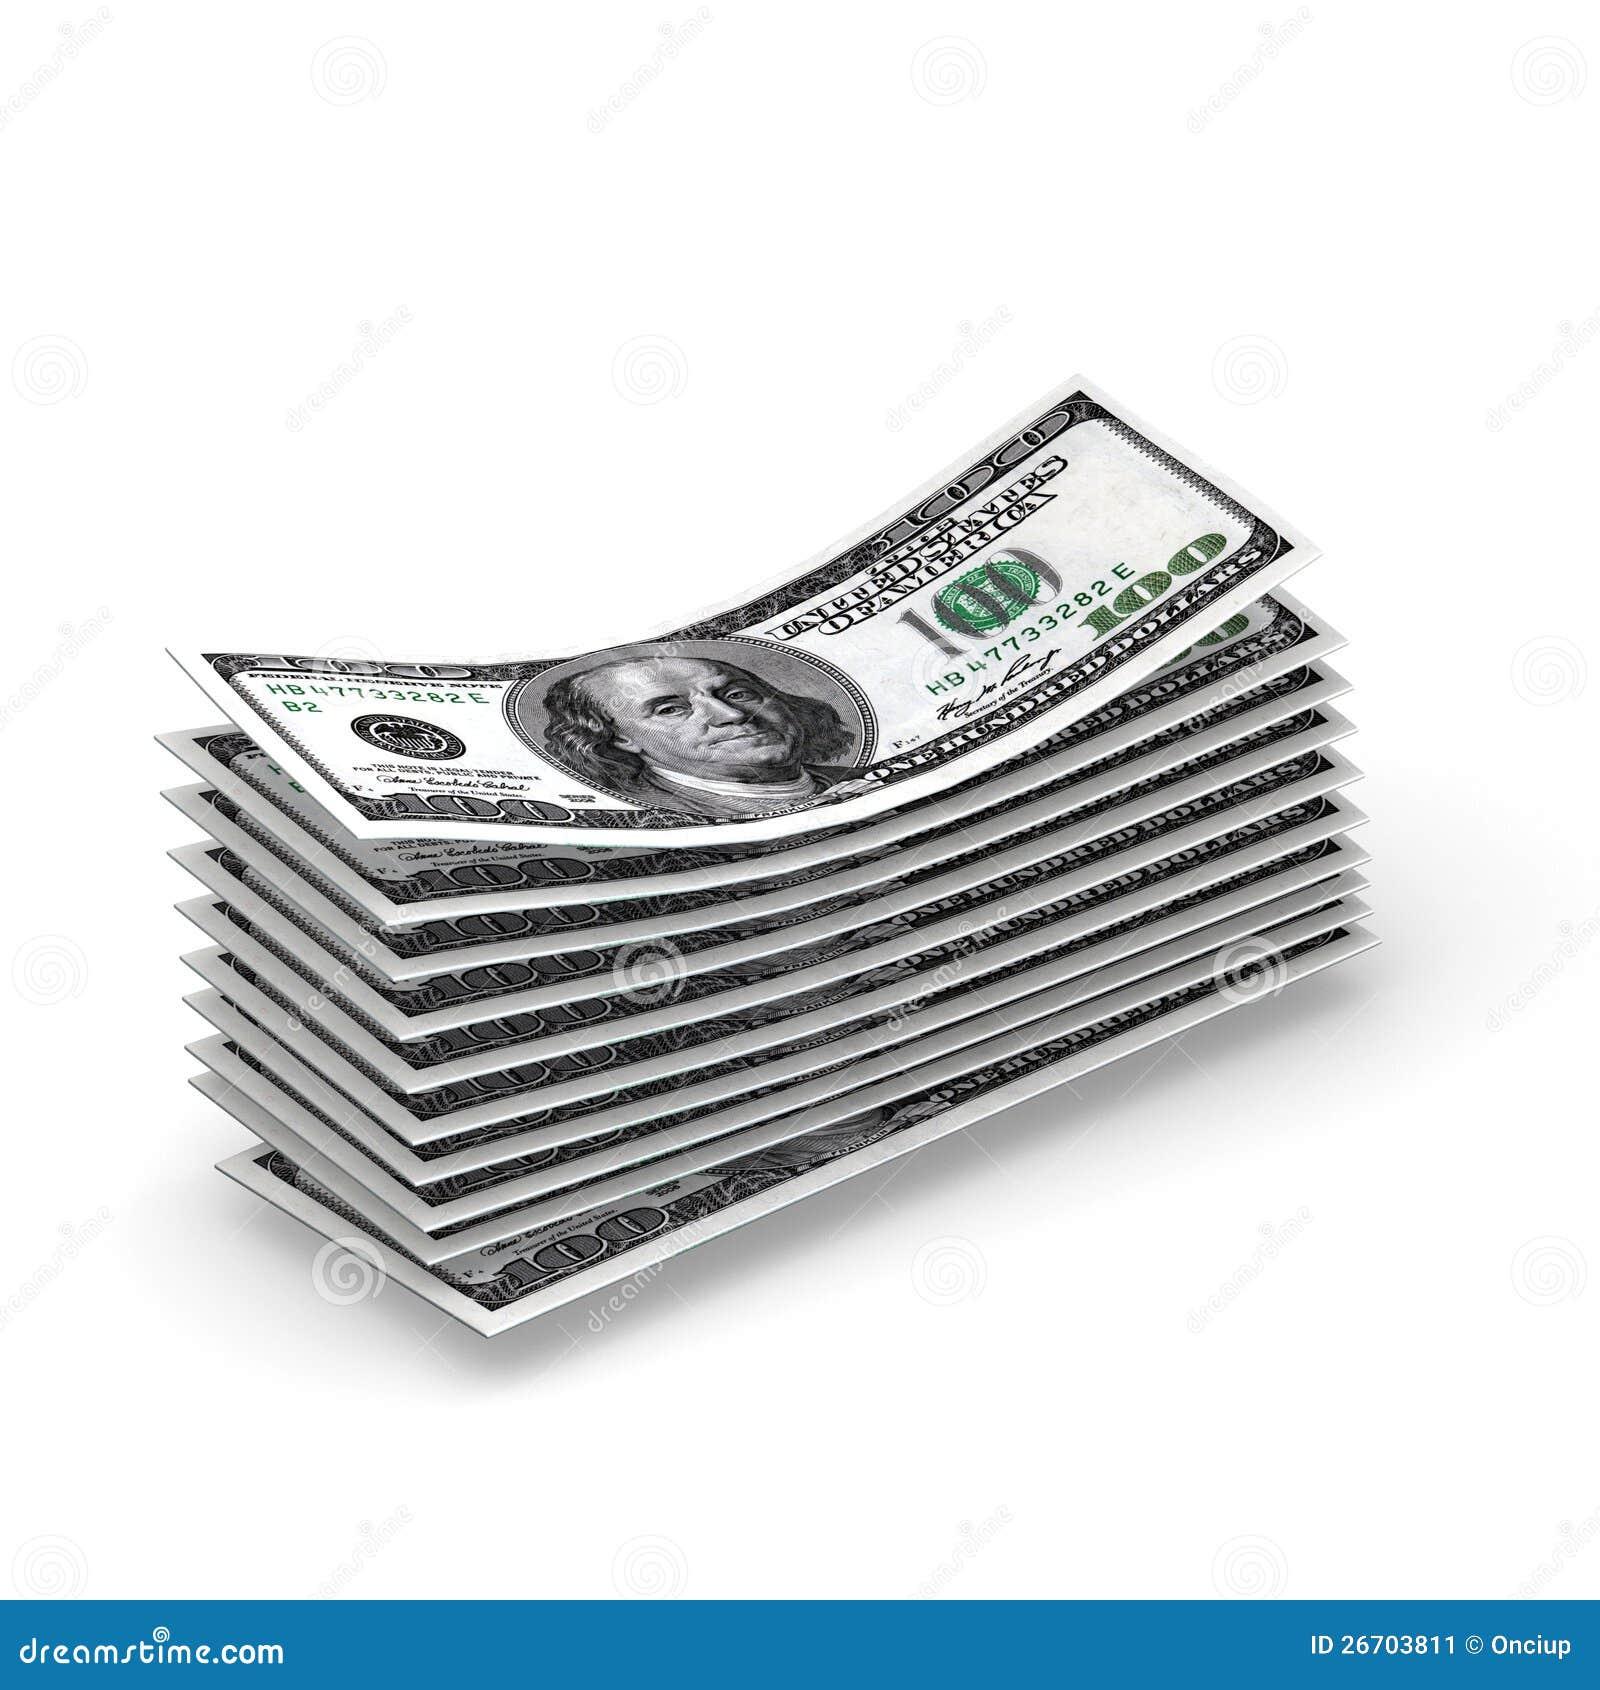 Cash flow - dollars